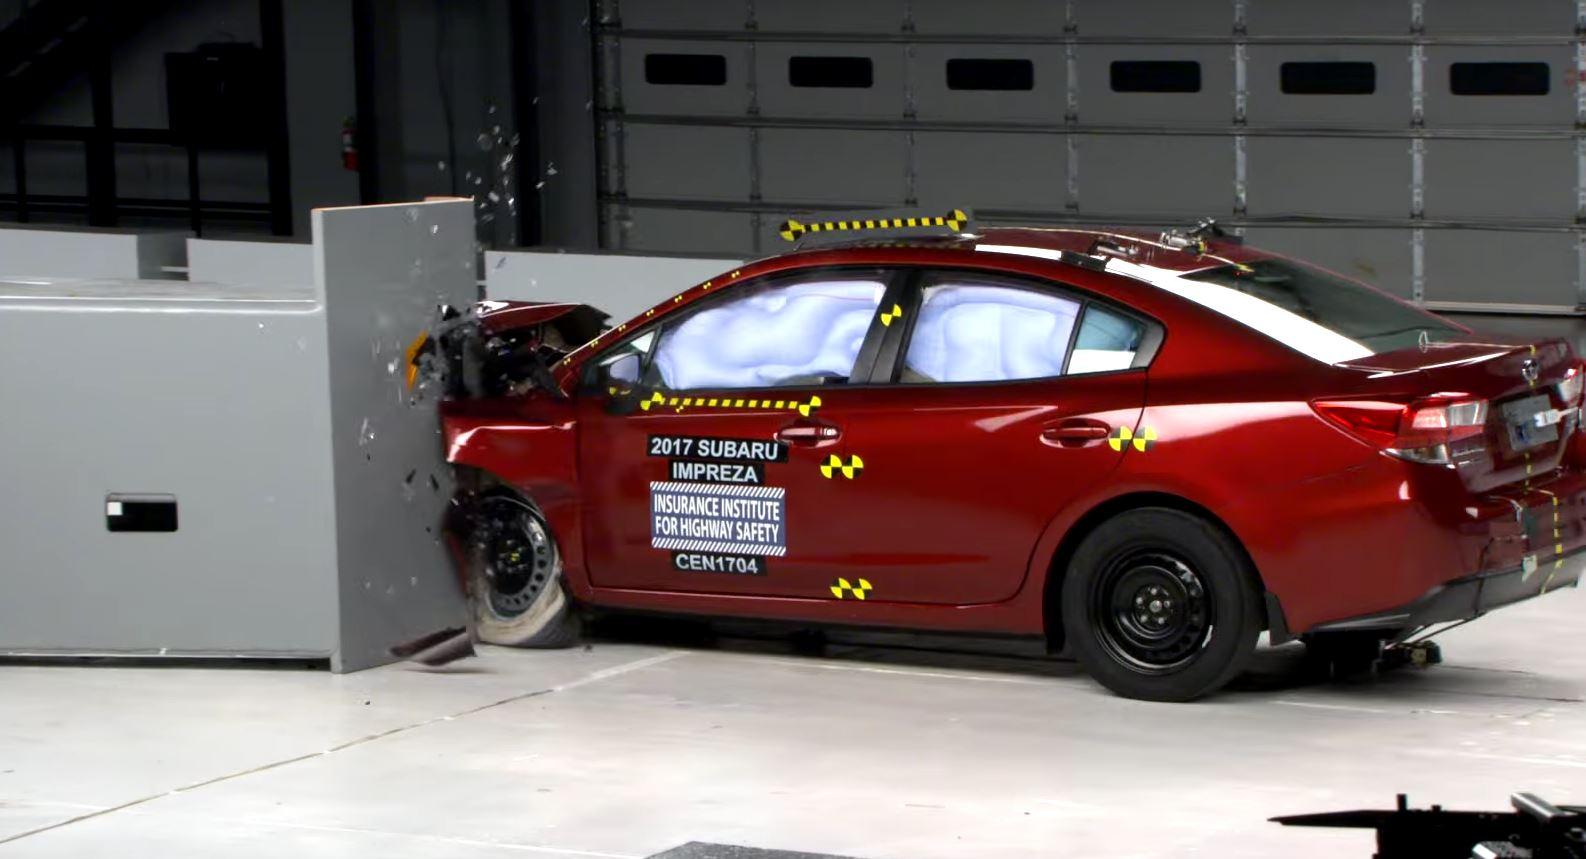 2017 Subaru Impreza Gets IIHS Top Safety Pick Rating  autoevolution